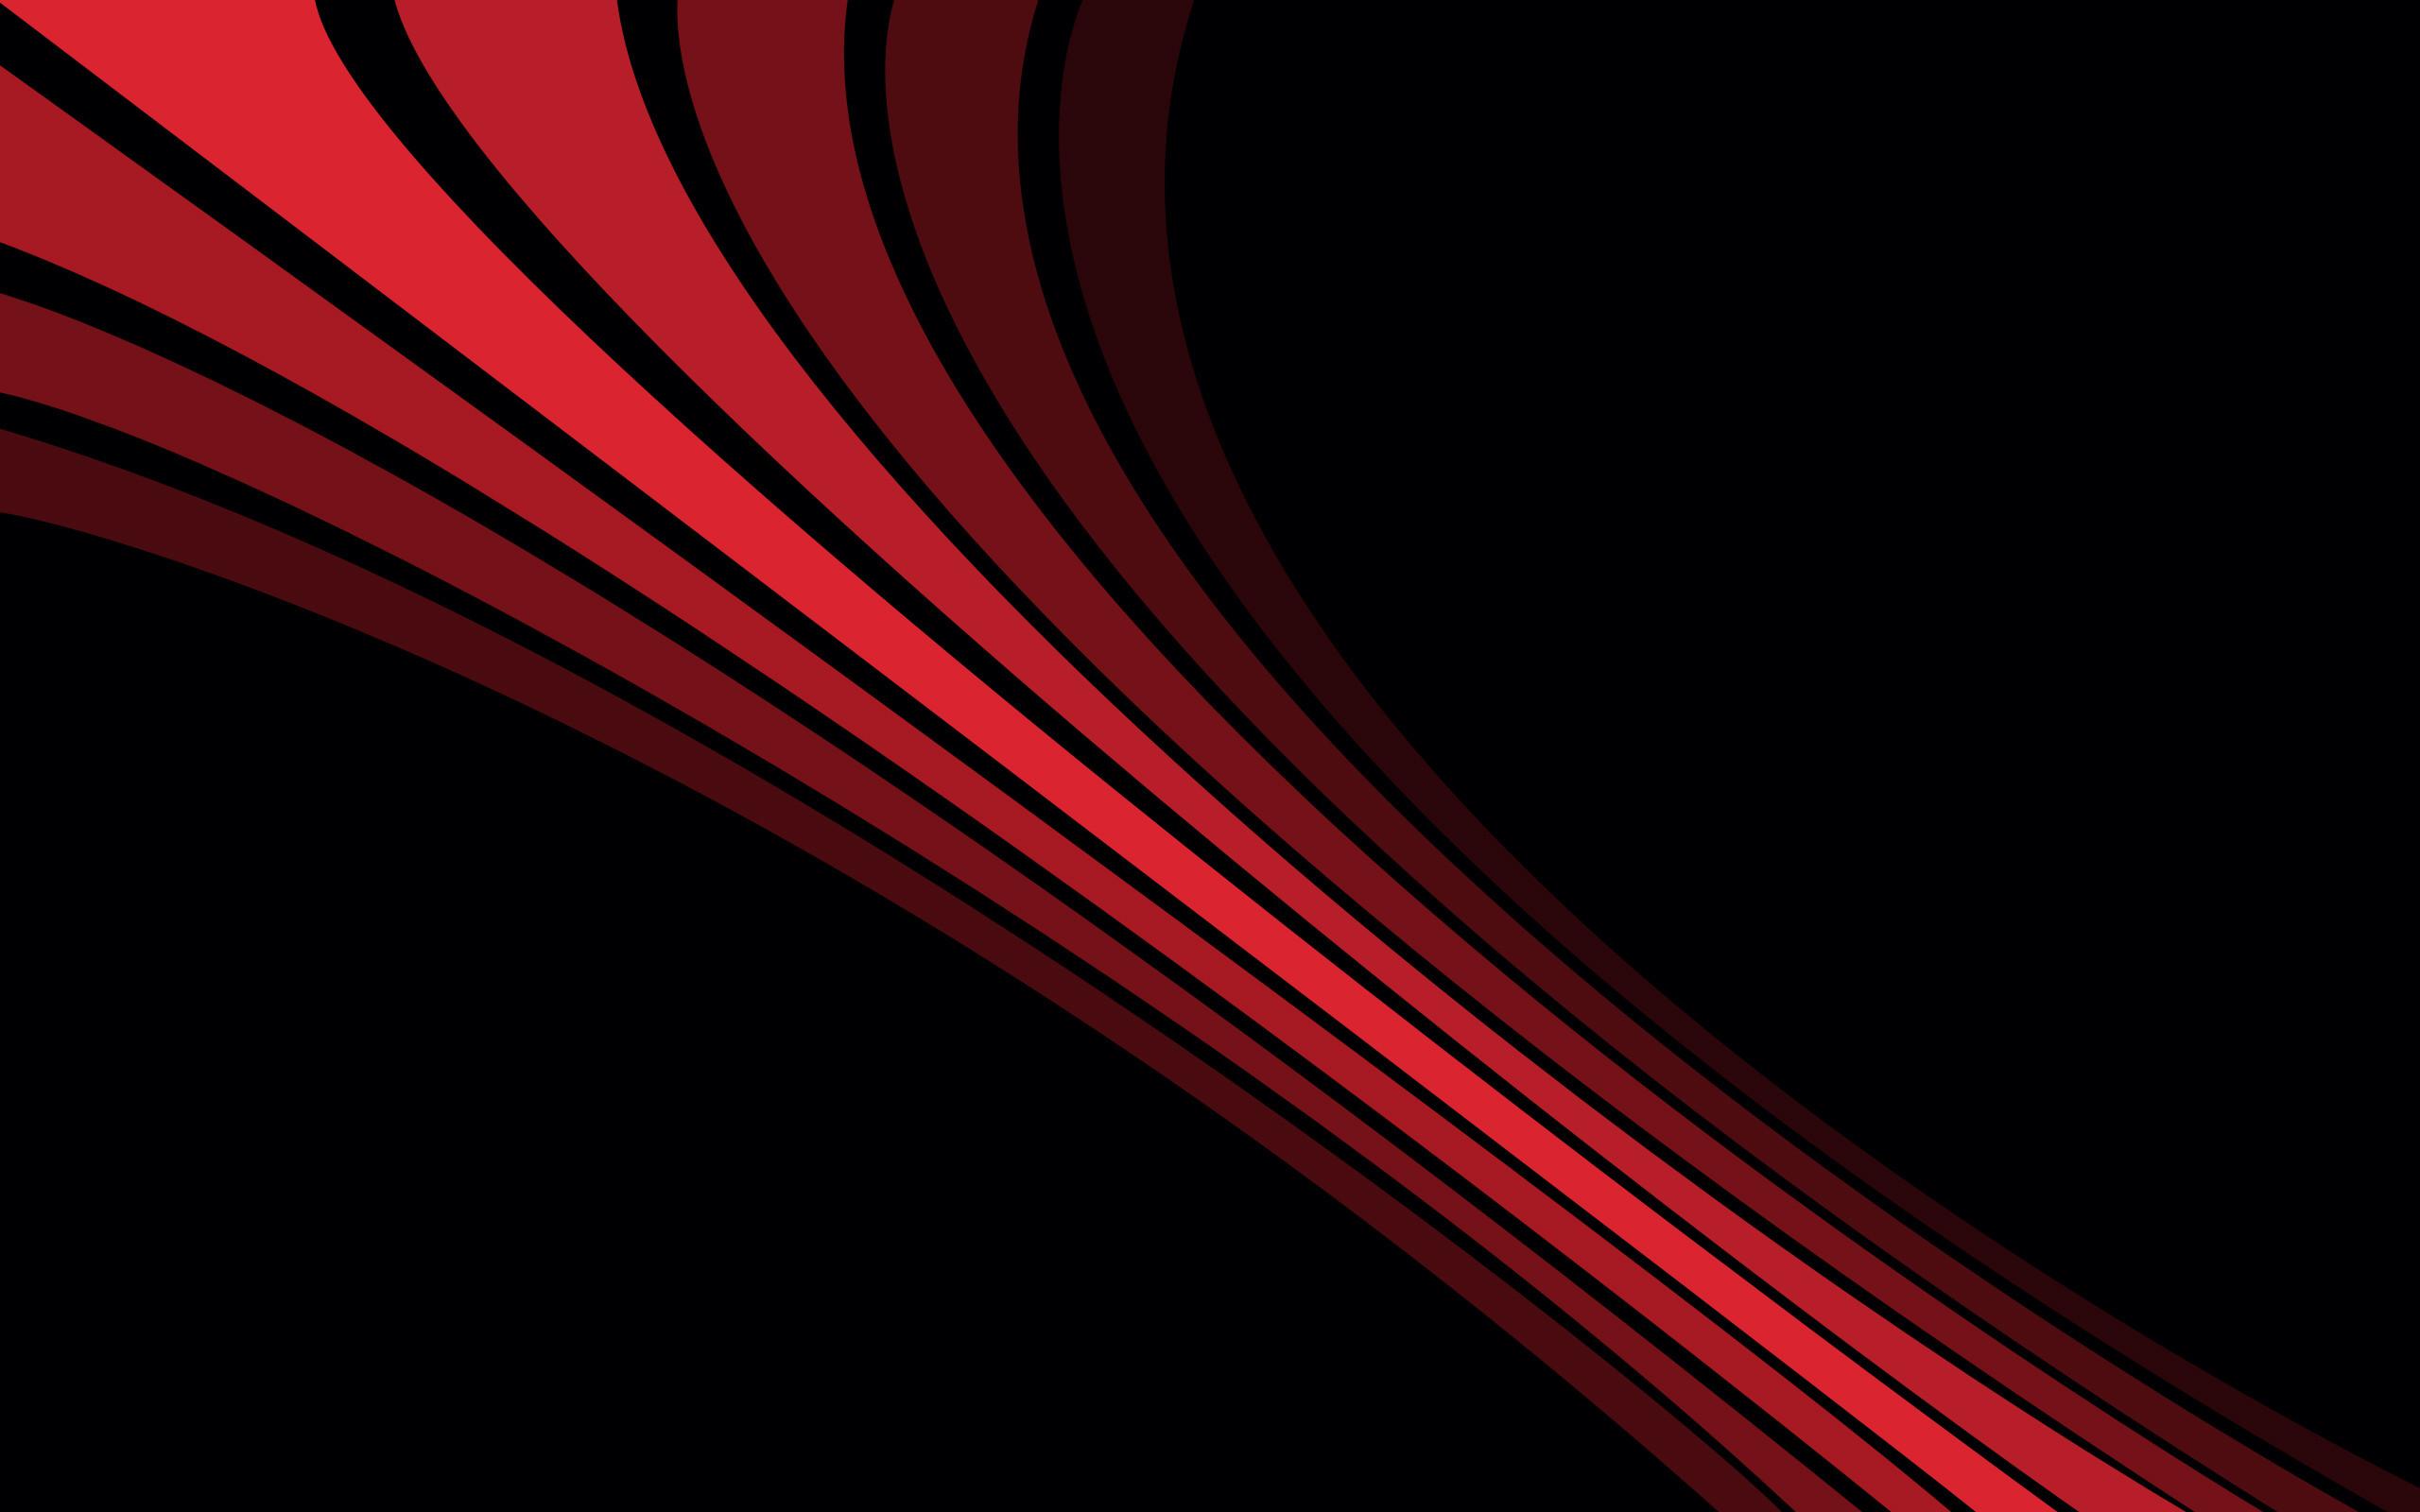 Cool Red And Black Desktop Background 1 Free Hd Wallpaper Wallpaper #6038